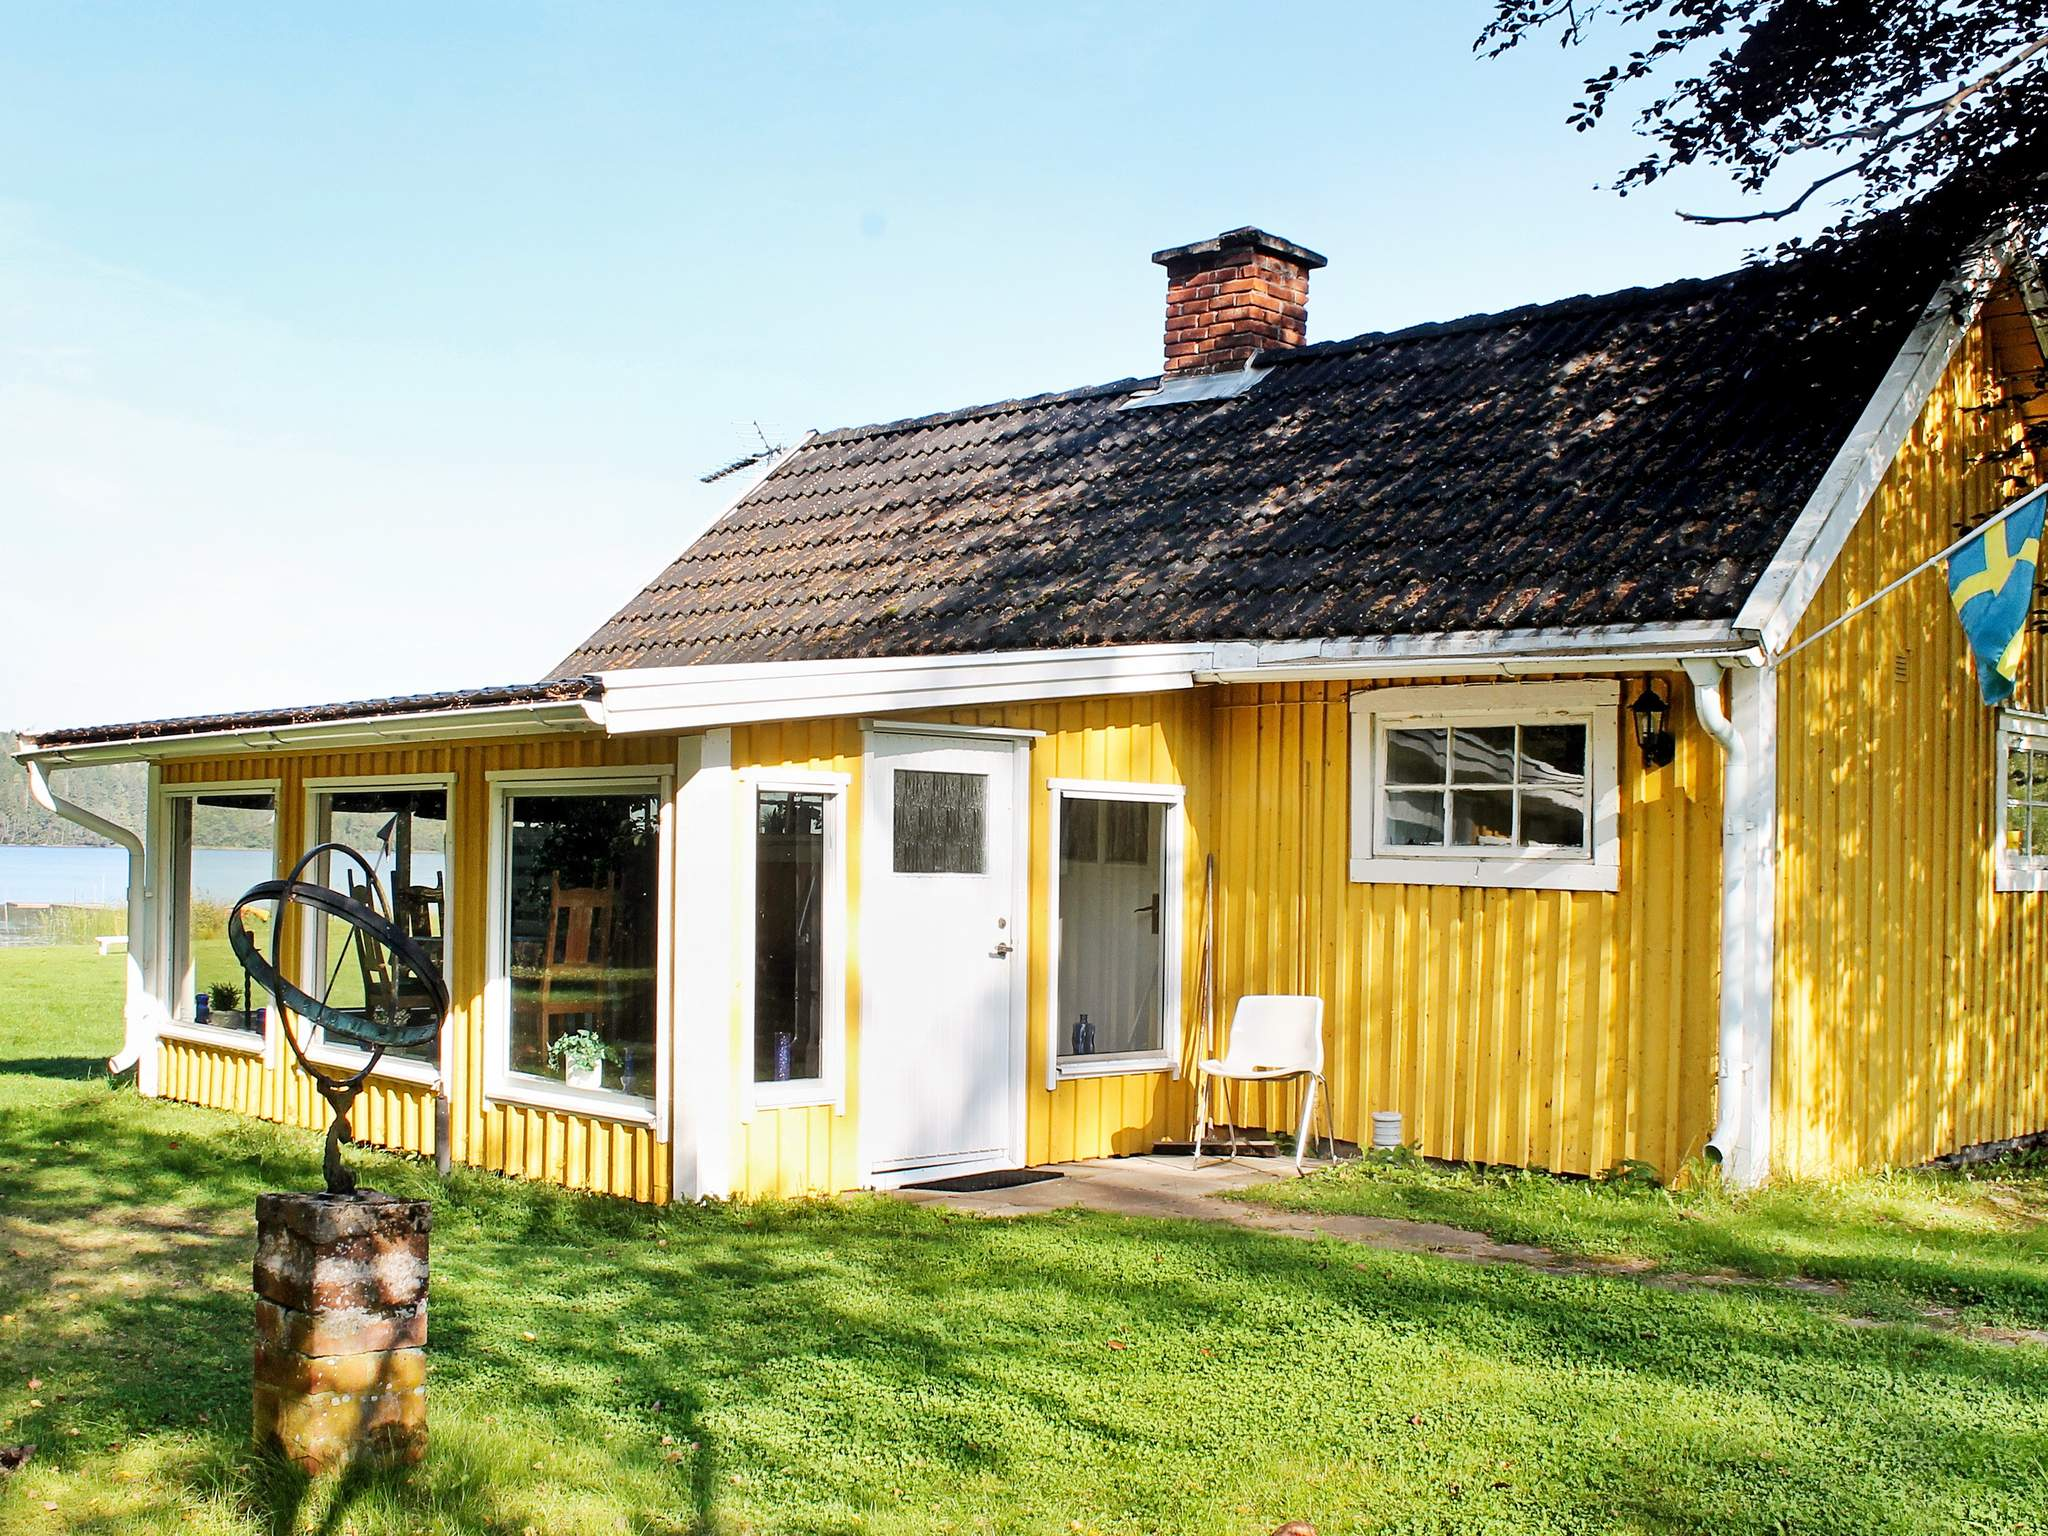 Ferienhaus Melldala (82014), Lerdala, Västra Götaland län, Westschweden, Schweden, Bild 1